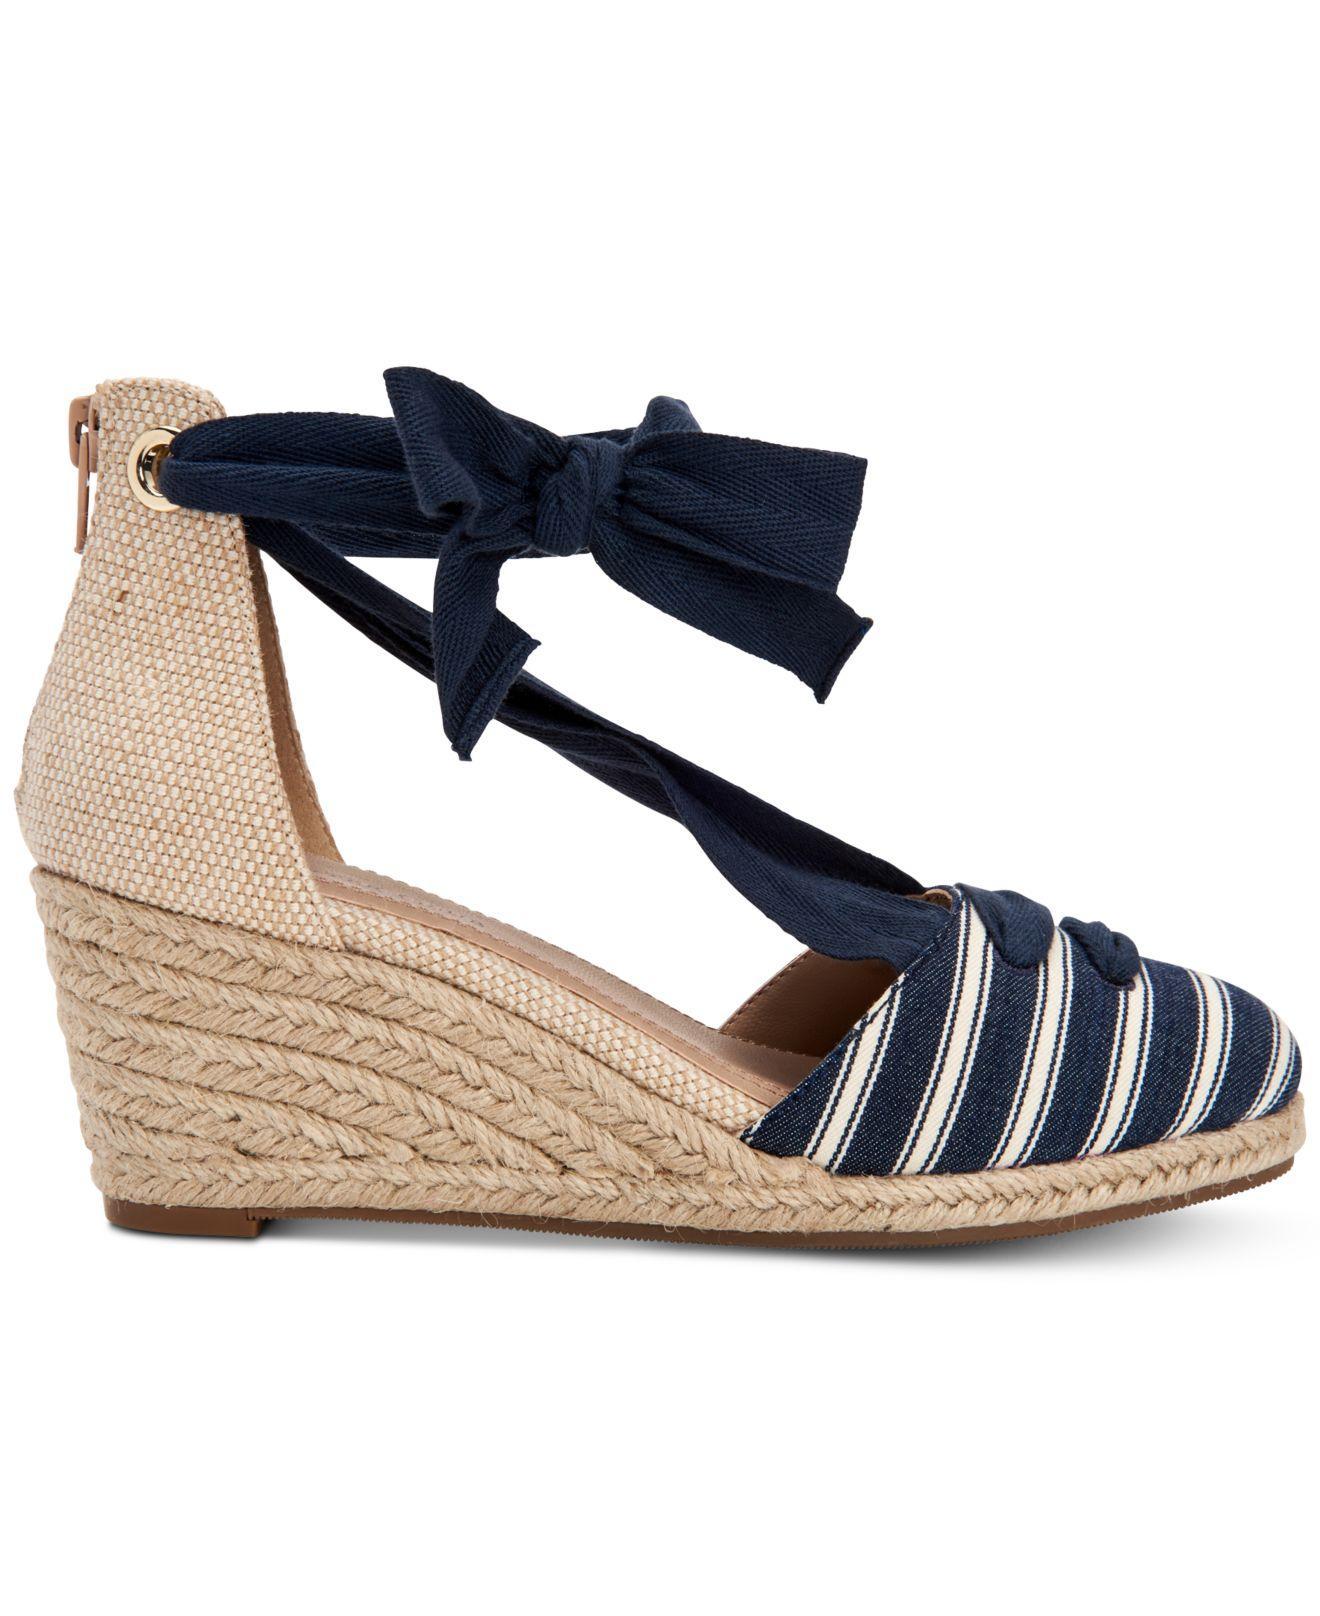 b9e864f29635 Lyst - Charter Club Maritzaa Wedge Sandals